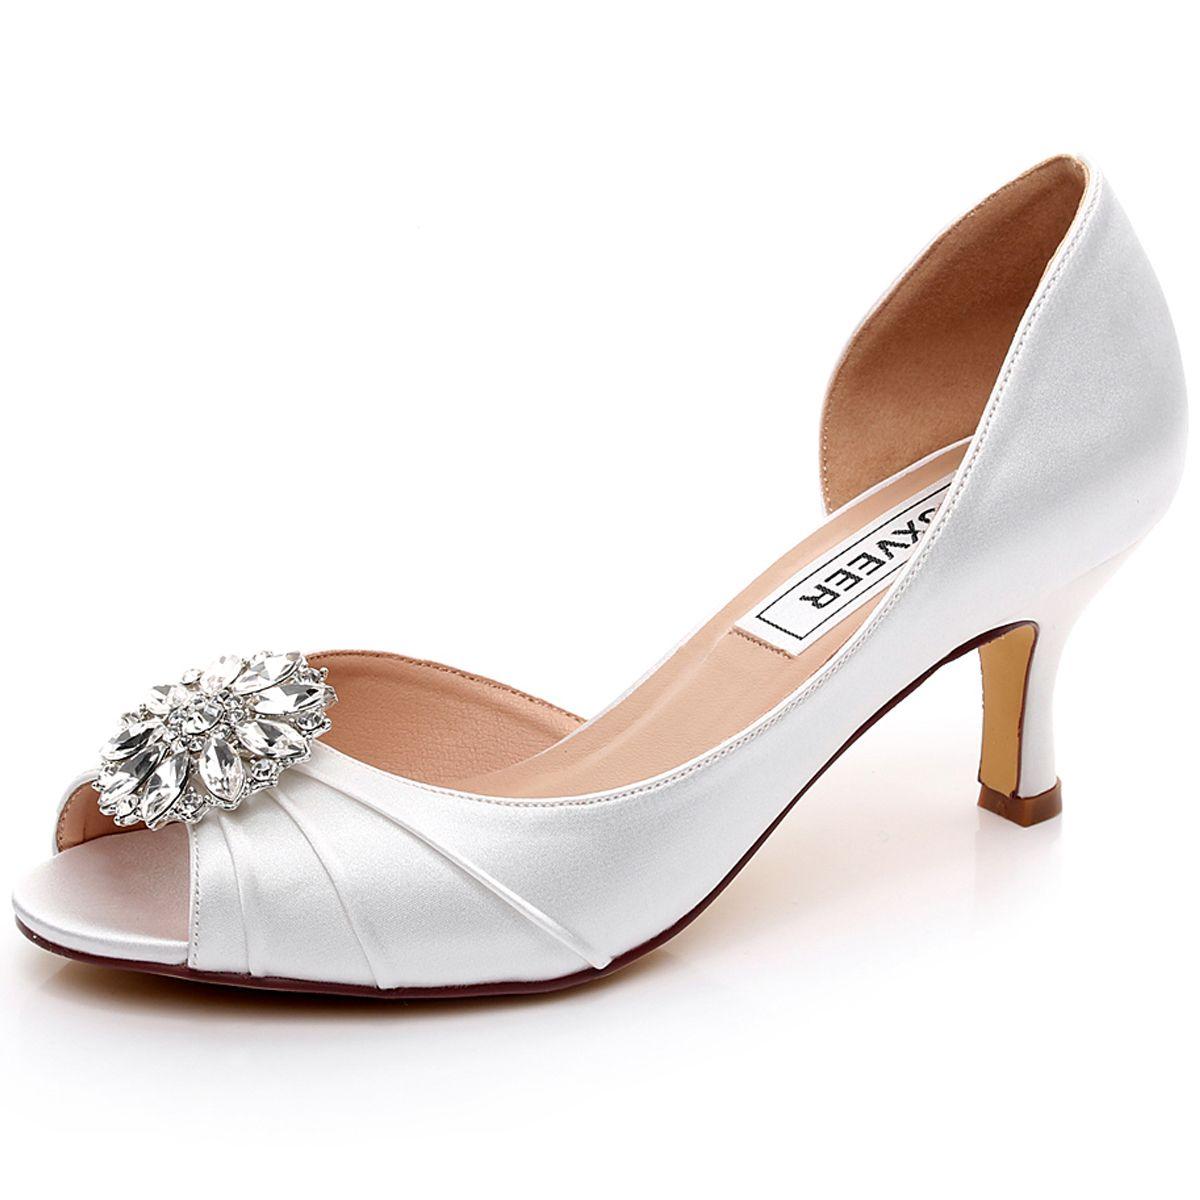 Satin Elegant Satin Shoes Royal Blue Dress Shoes Blue Bridal